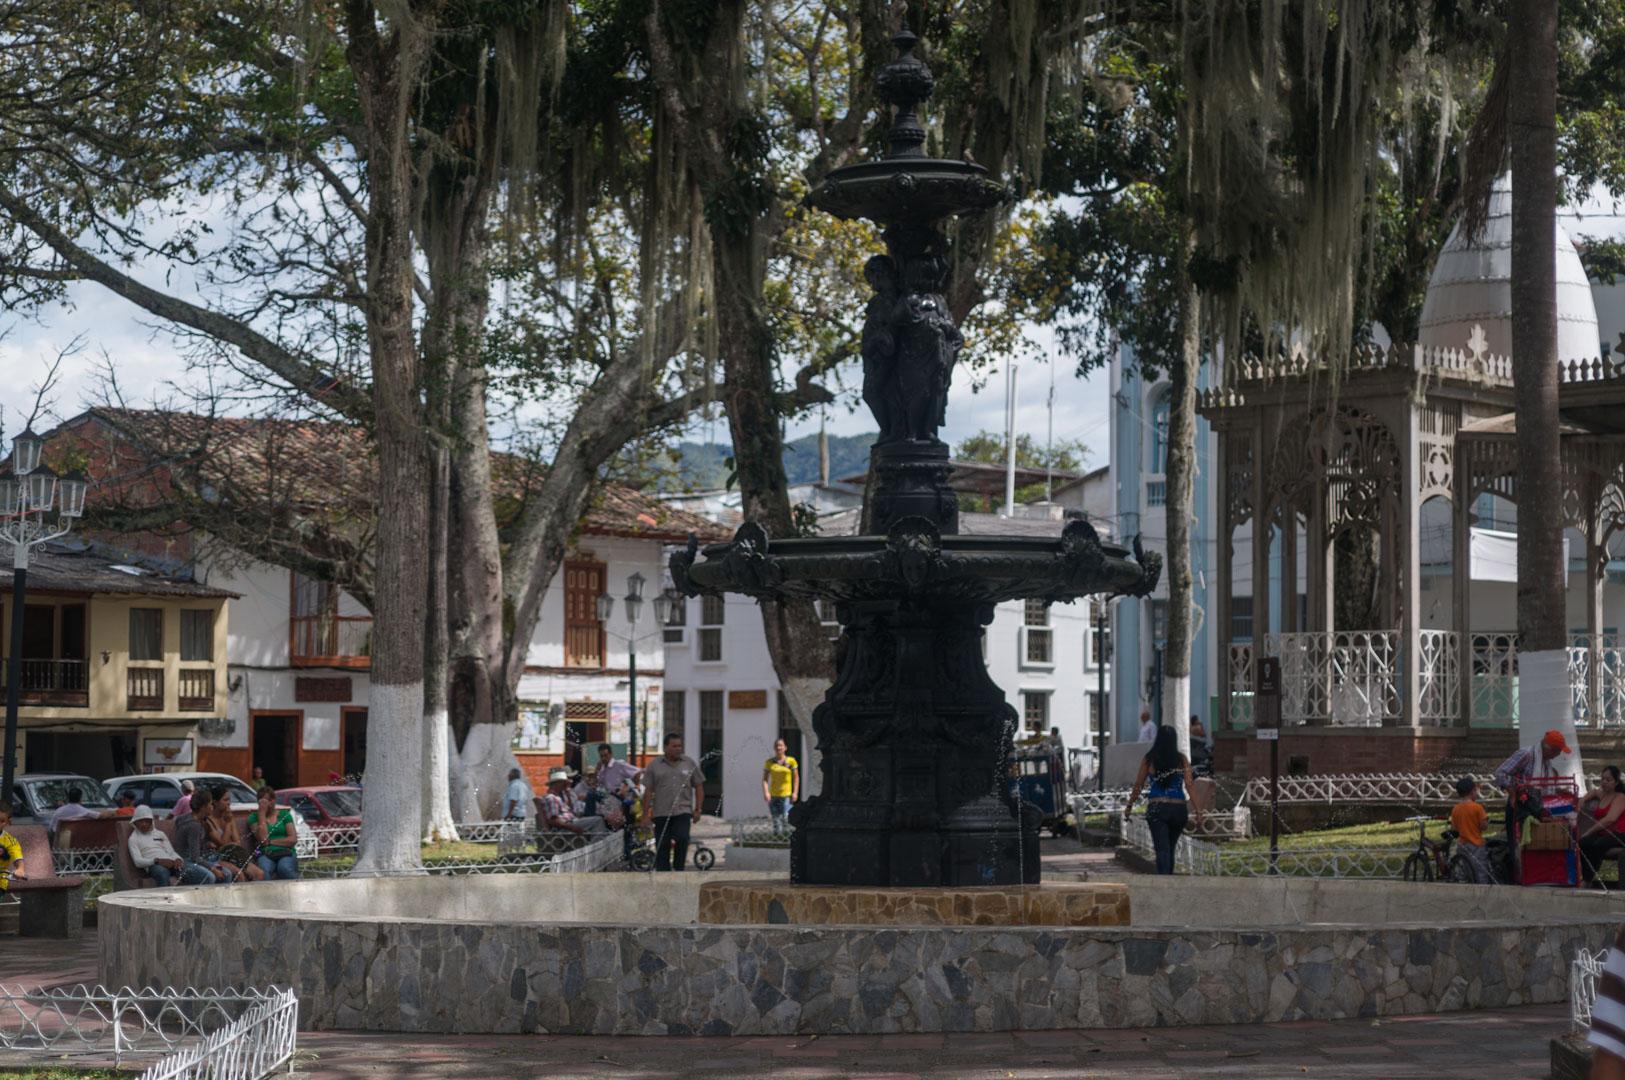 Salamina Central Parque